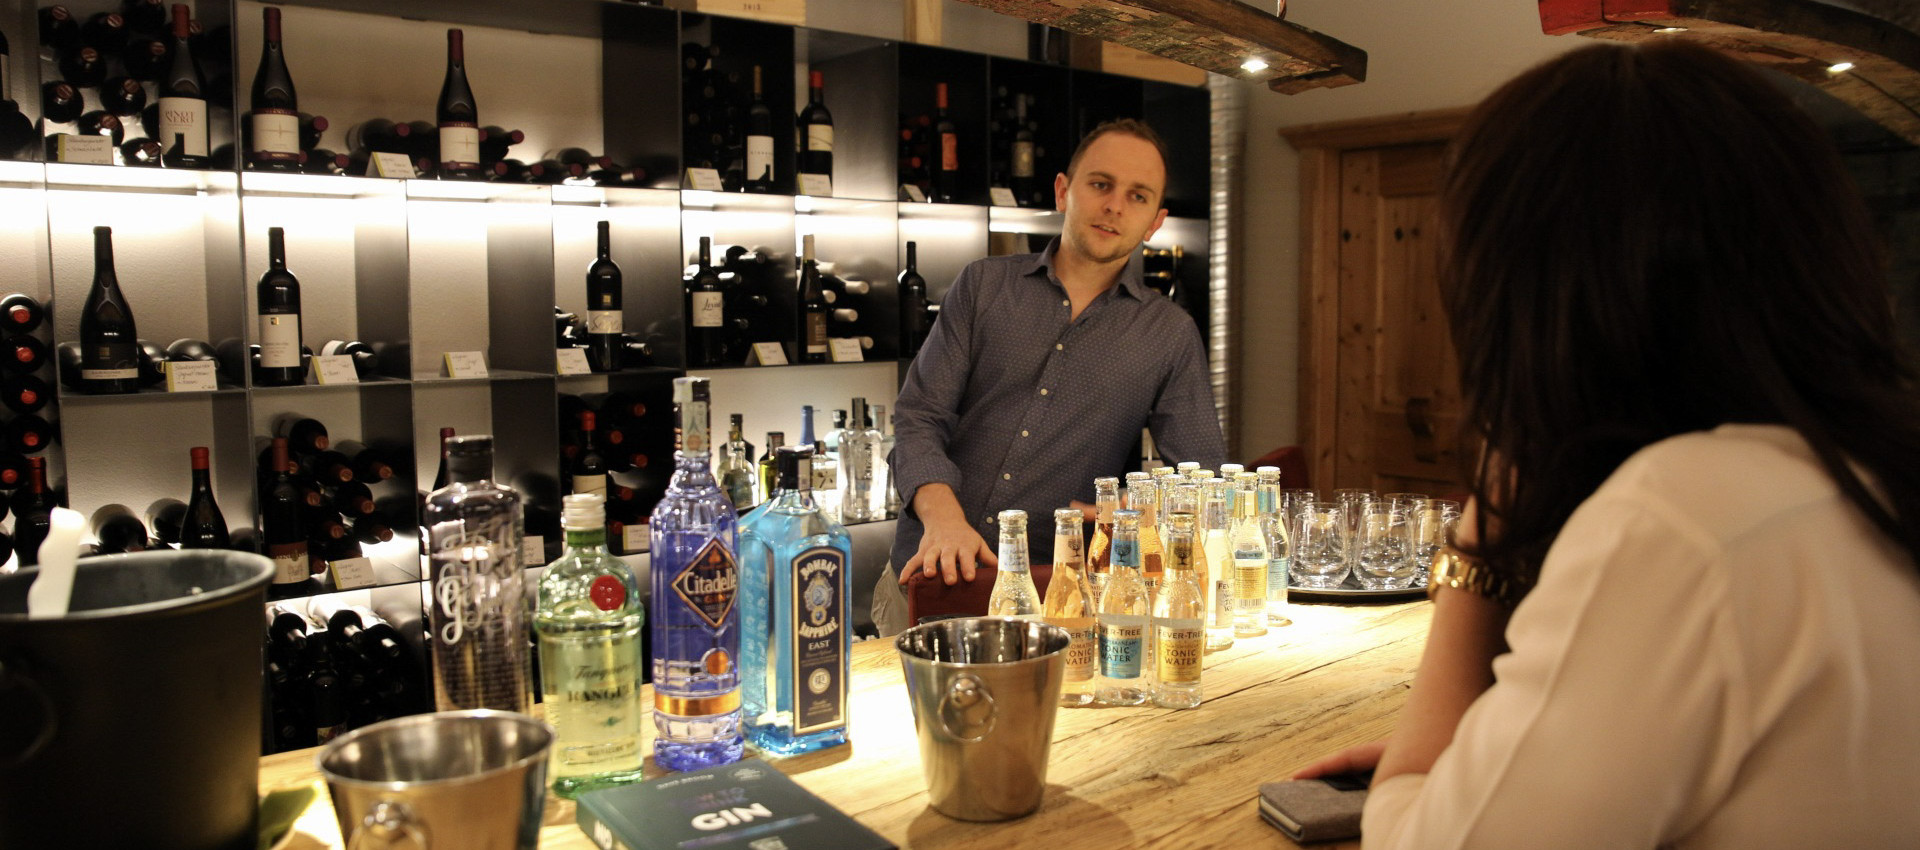 Hotel 4 Sterne bei Meran, Gin Kulinari